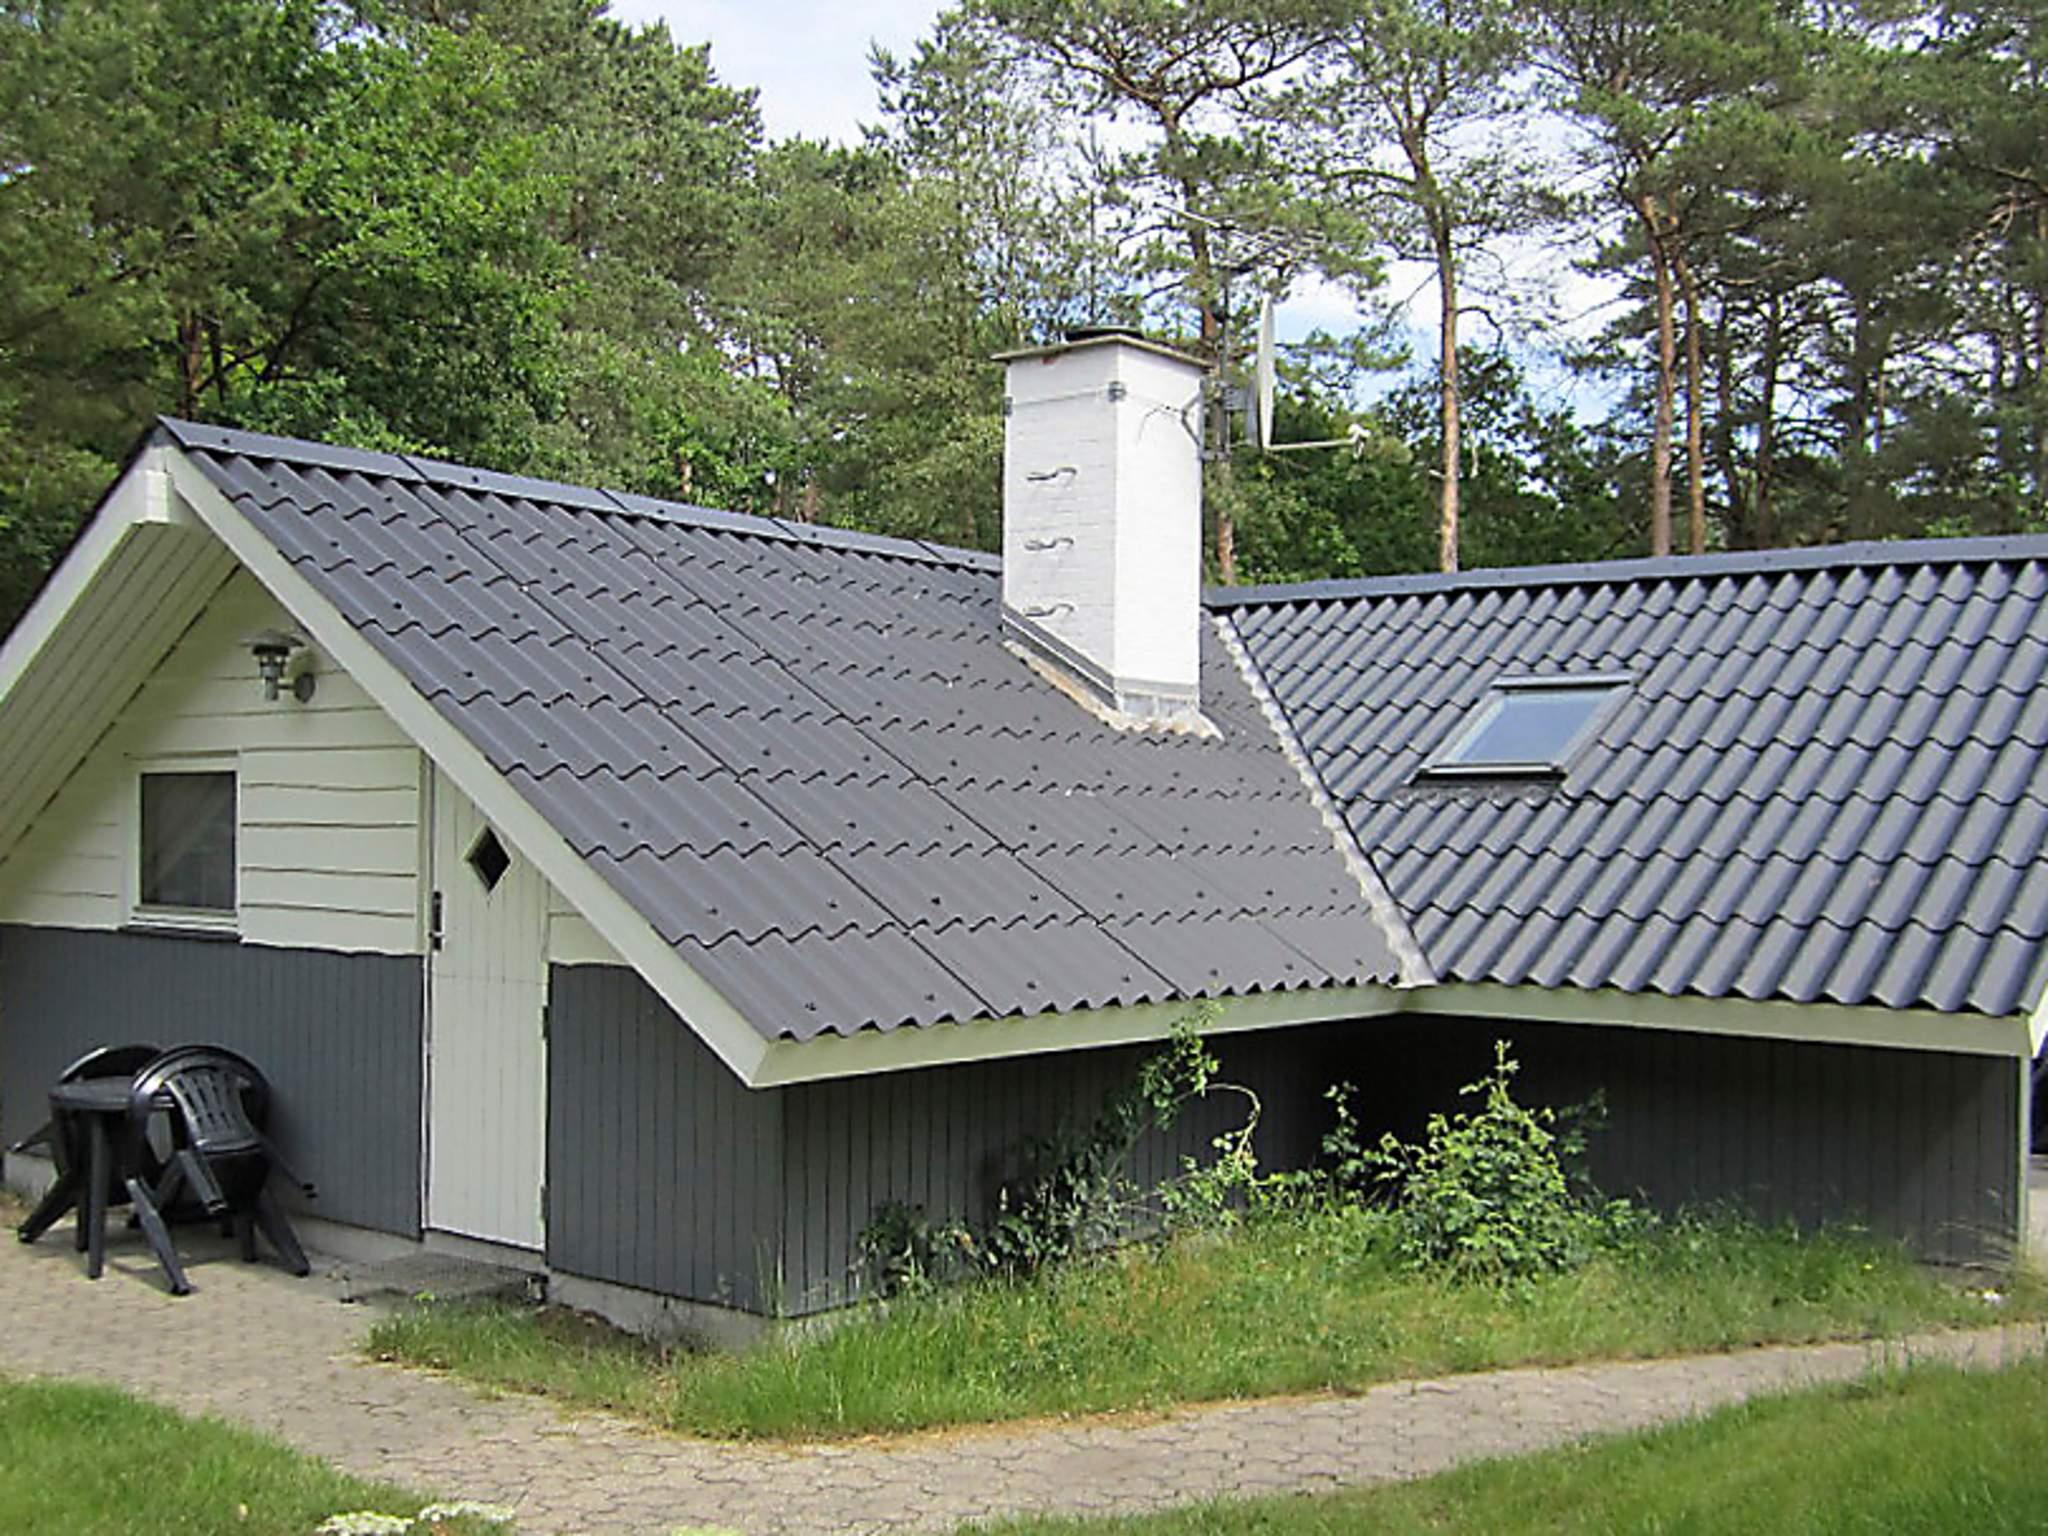 Ferienhaus Hou Nord/Melholt (88048), Hou, , Nordostjütland, Dänemark, Bild 33